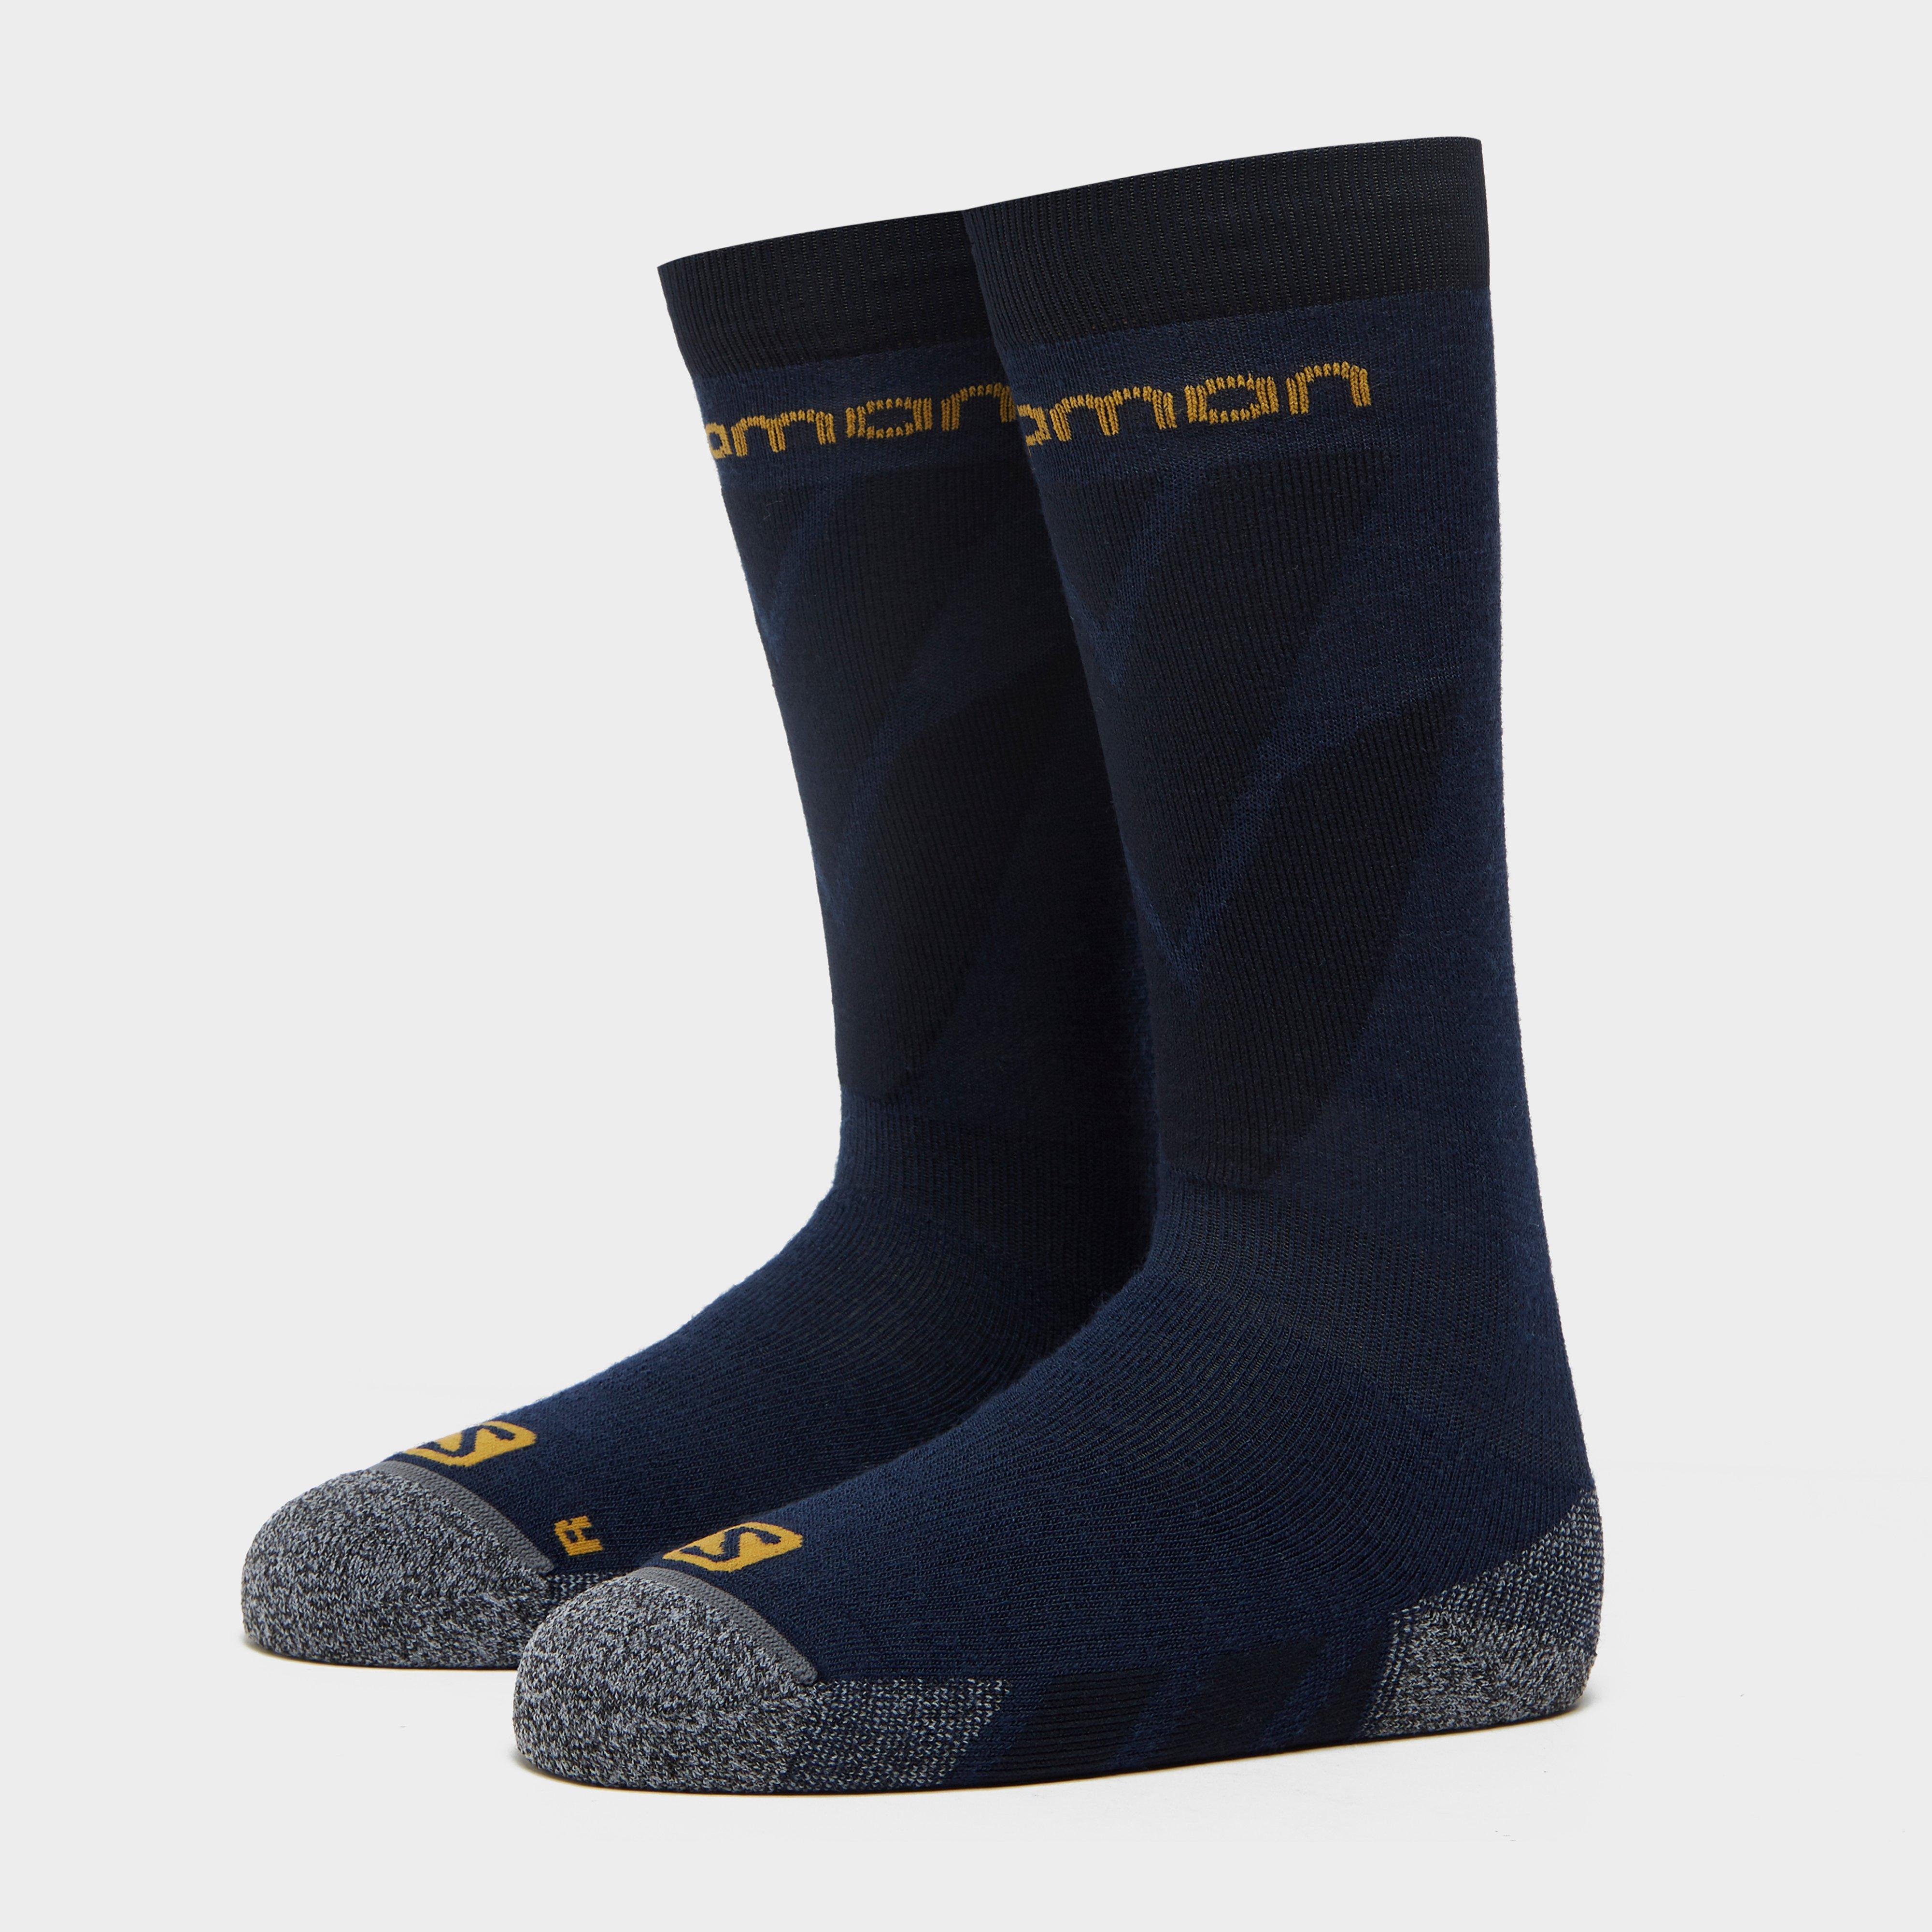 Salomon Socks Mens Access Ski Socks - Navy/nvy  Navy/nvy